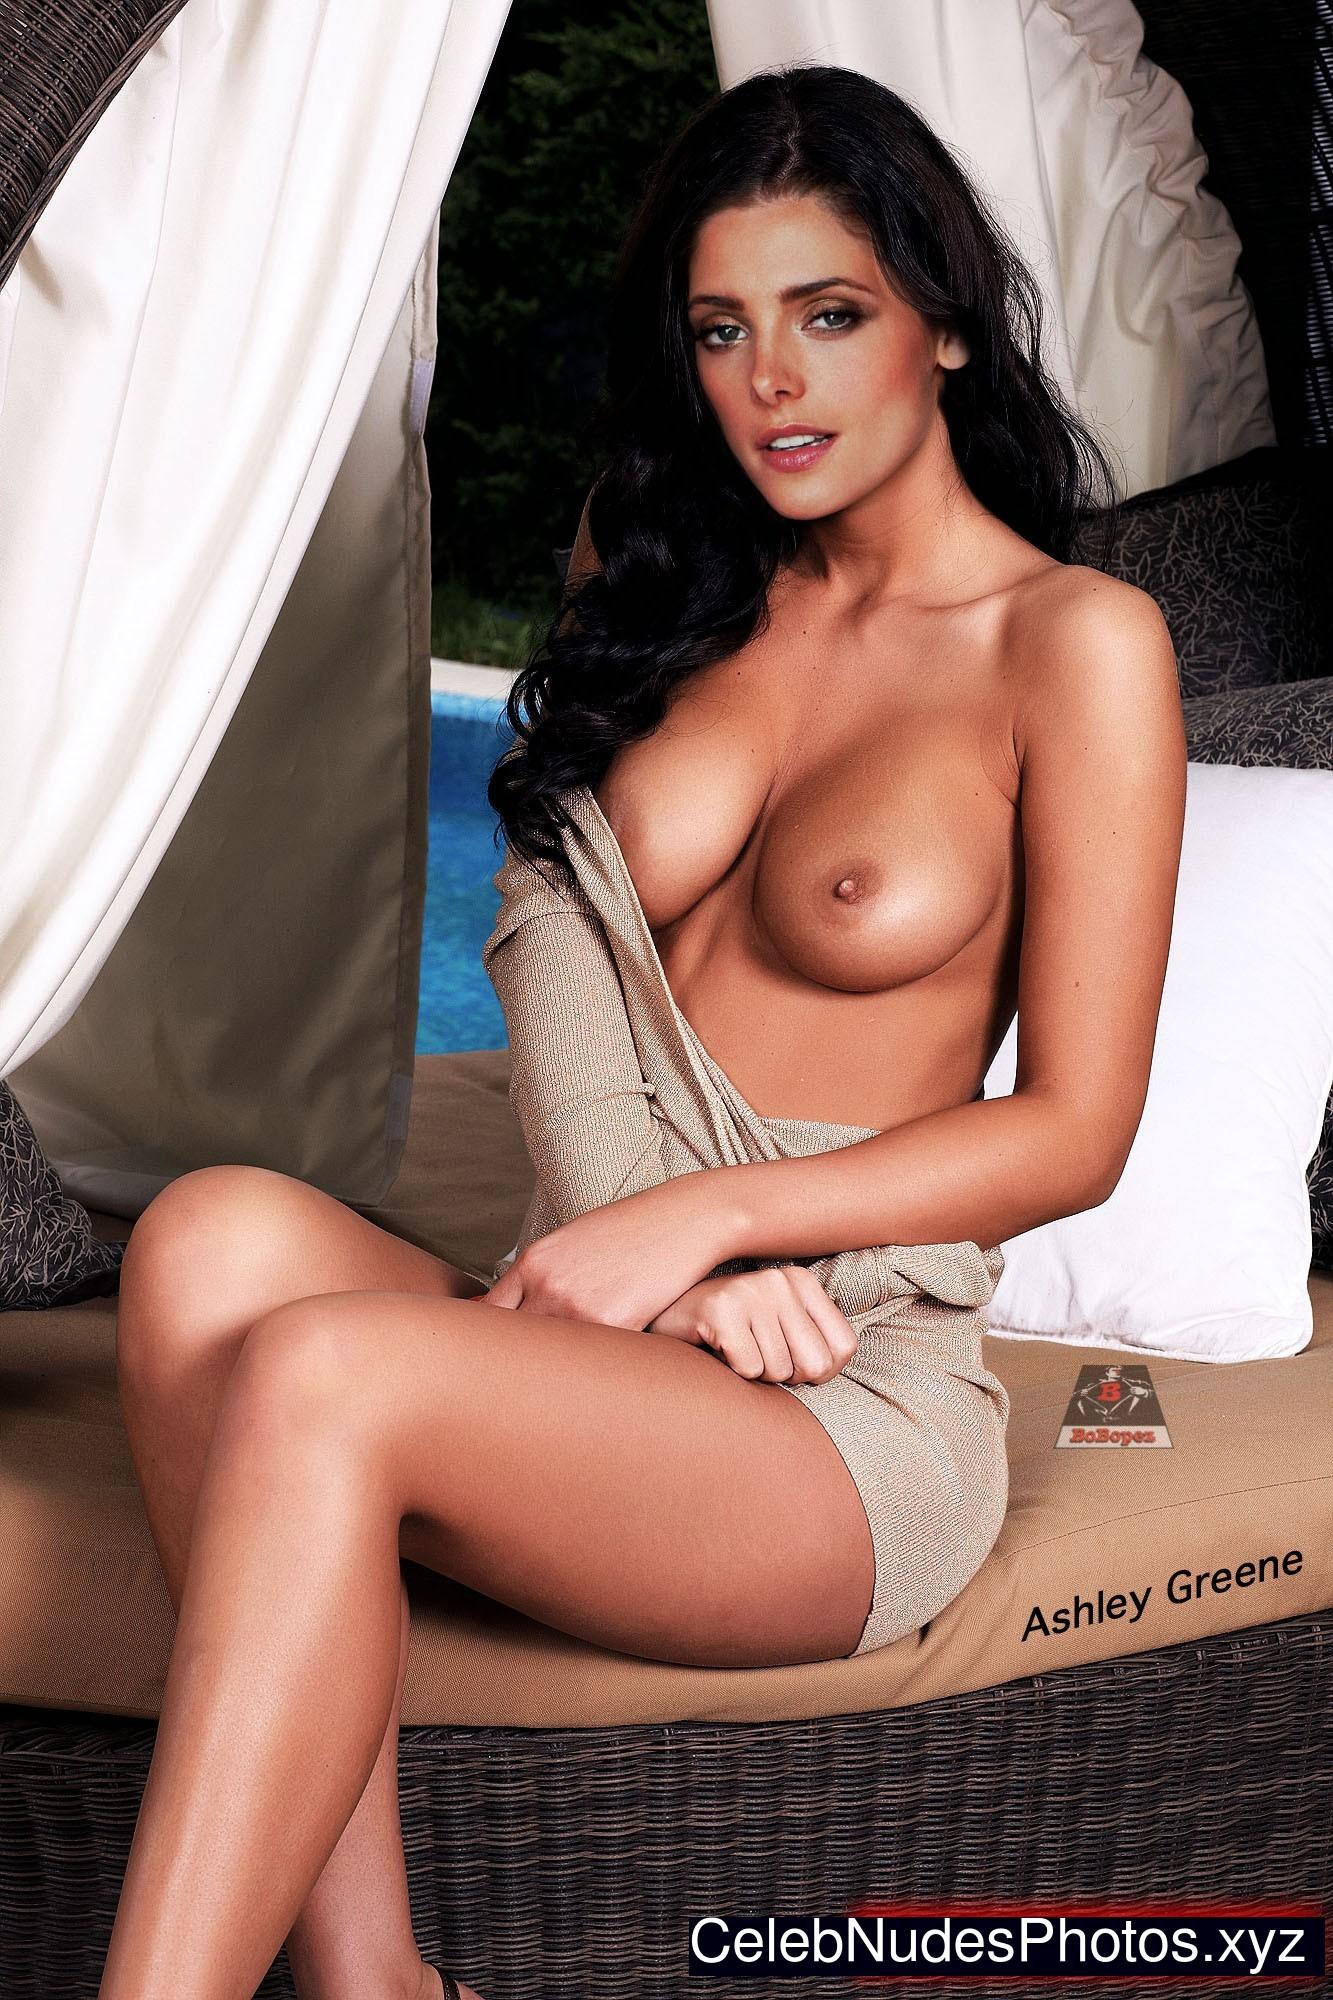 mikayla lace naked face sitting